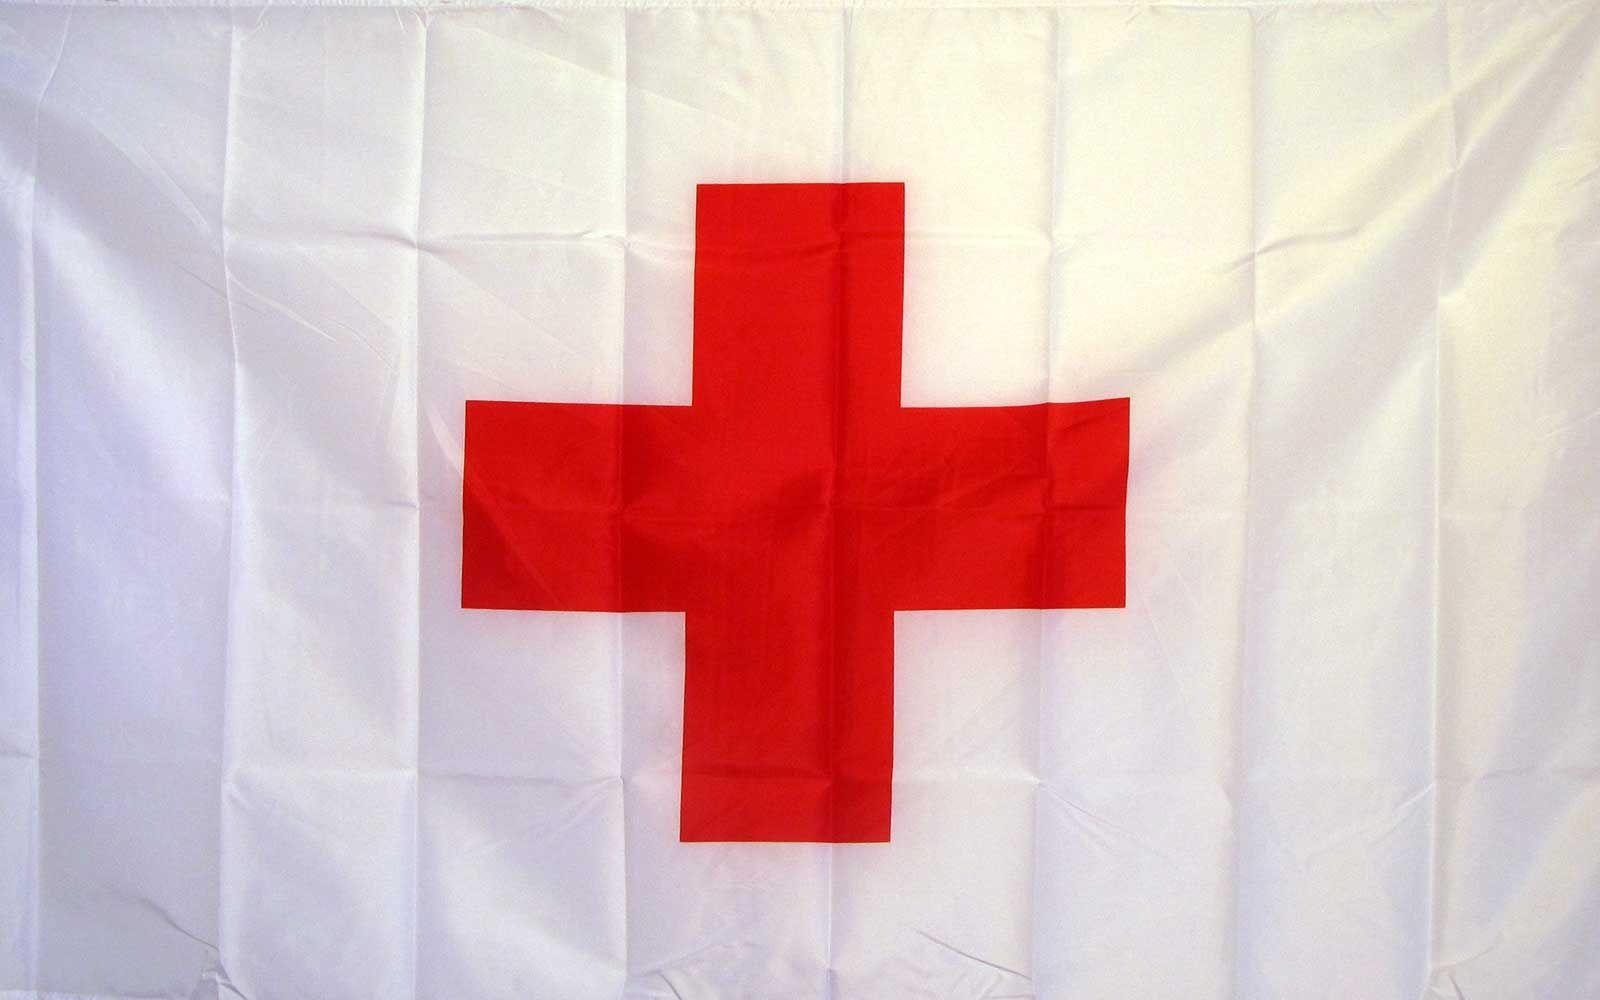 International Red Cross Historical 3 X 5 Flag Red Cross Flag International Red Cross